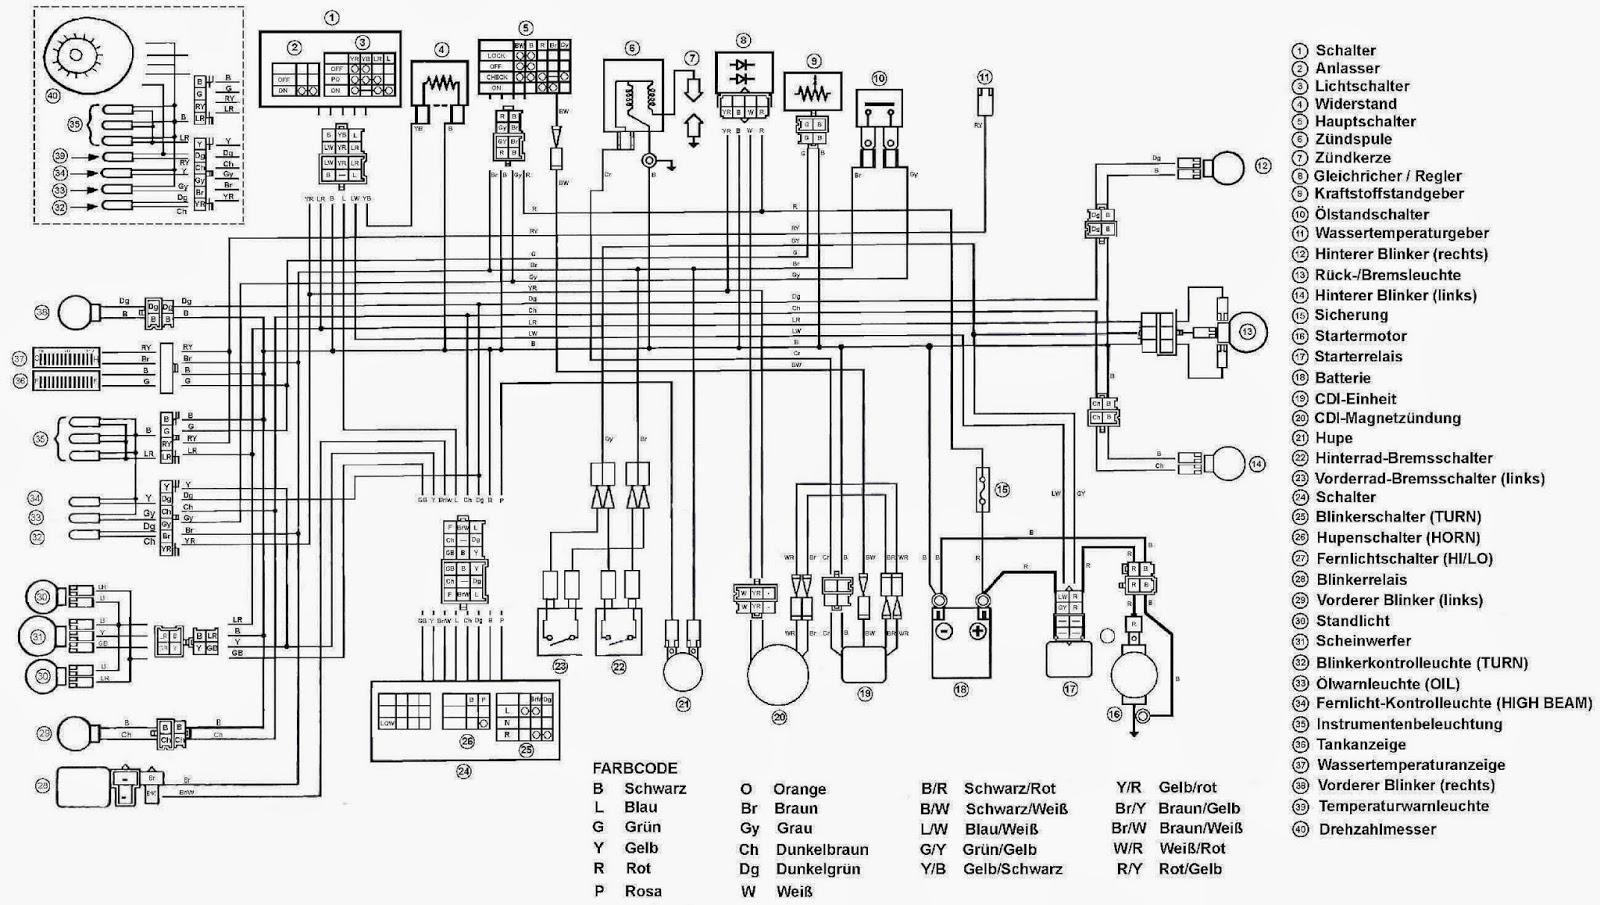 medium resolution of wiring diagram as well 1979 honda moreover 1979 cadillac 1979 cadillac seville wiring diagram electrical wiring